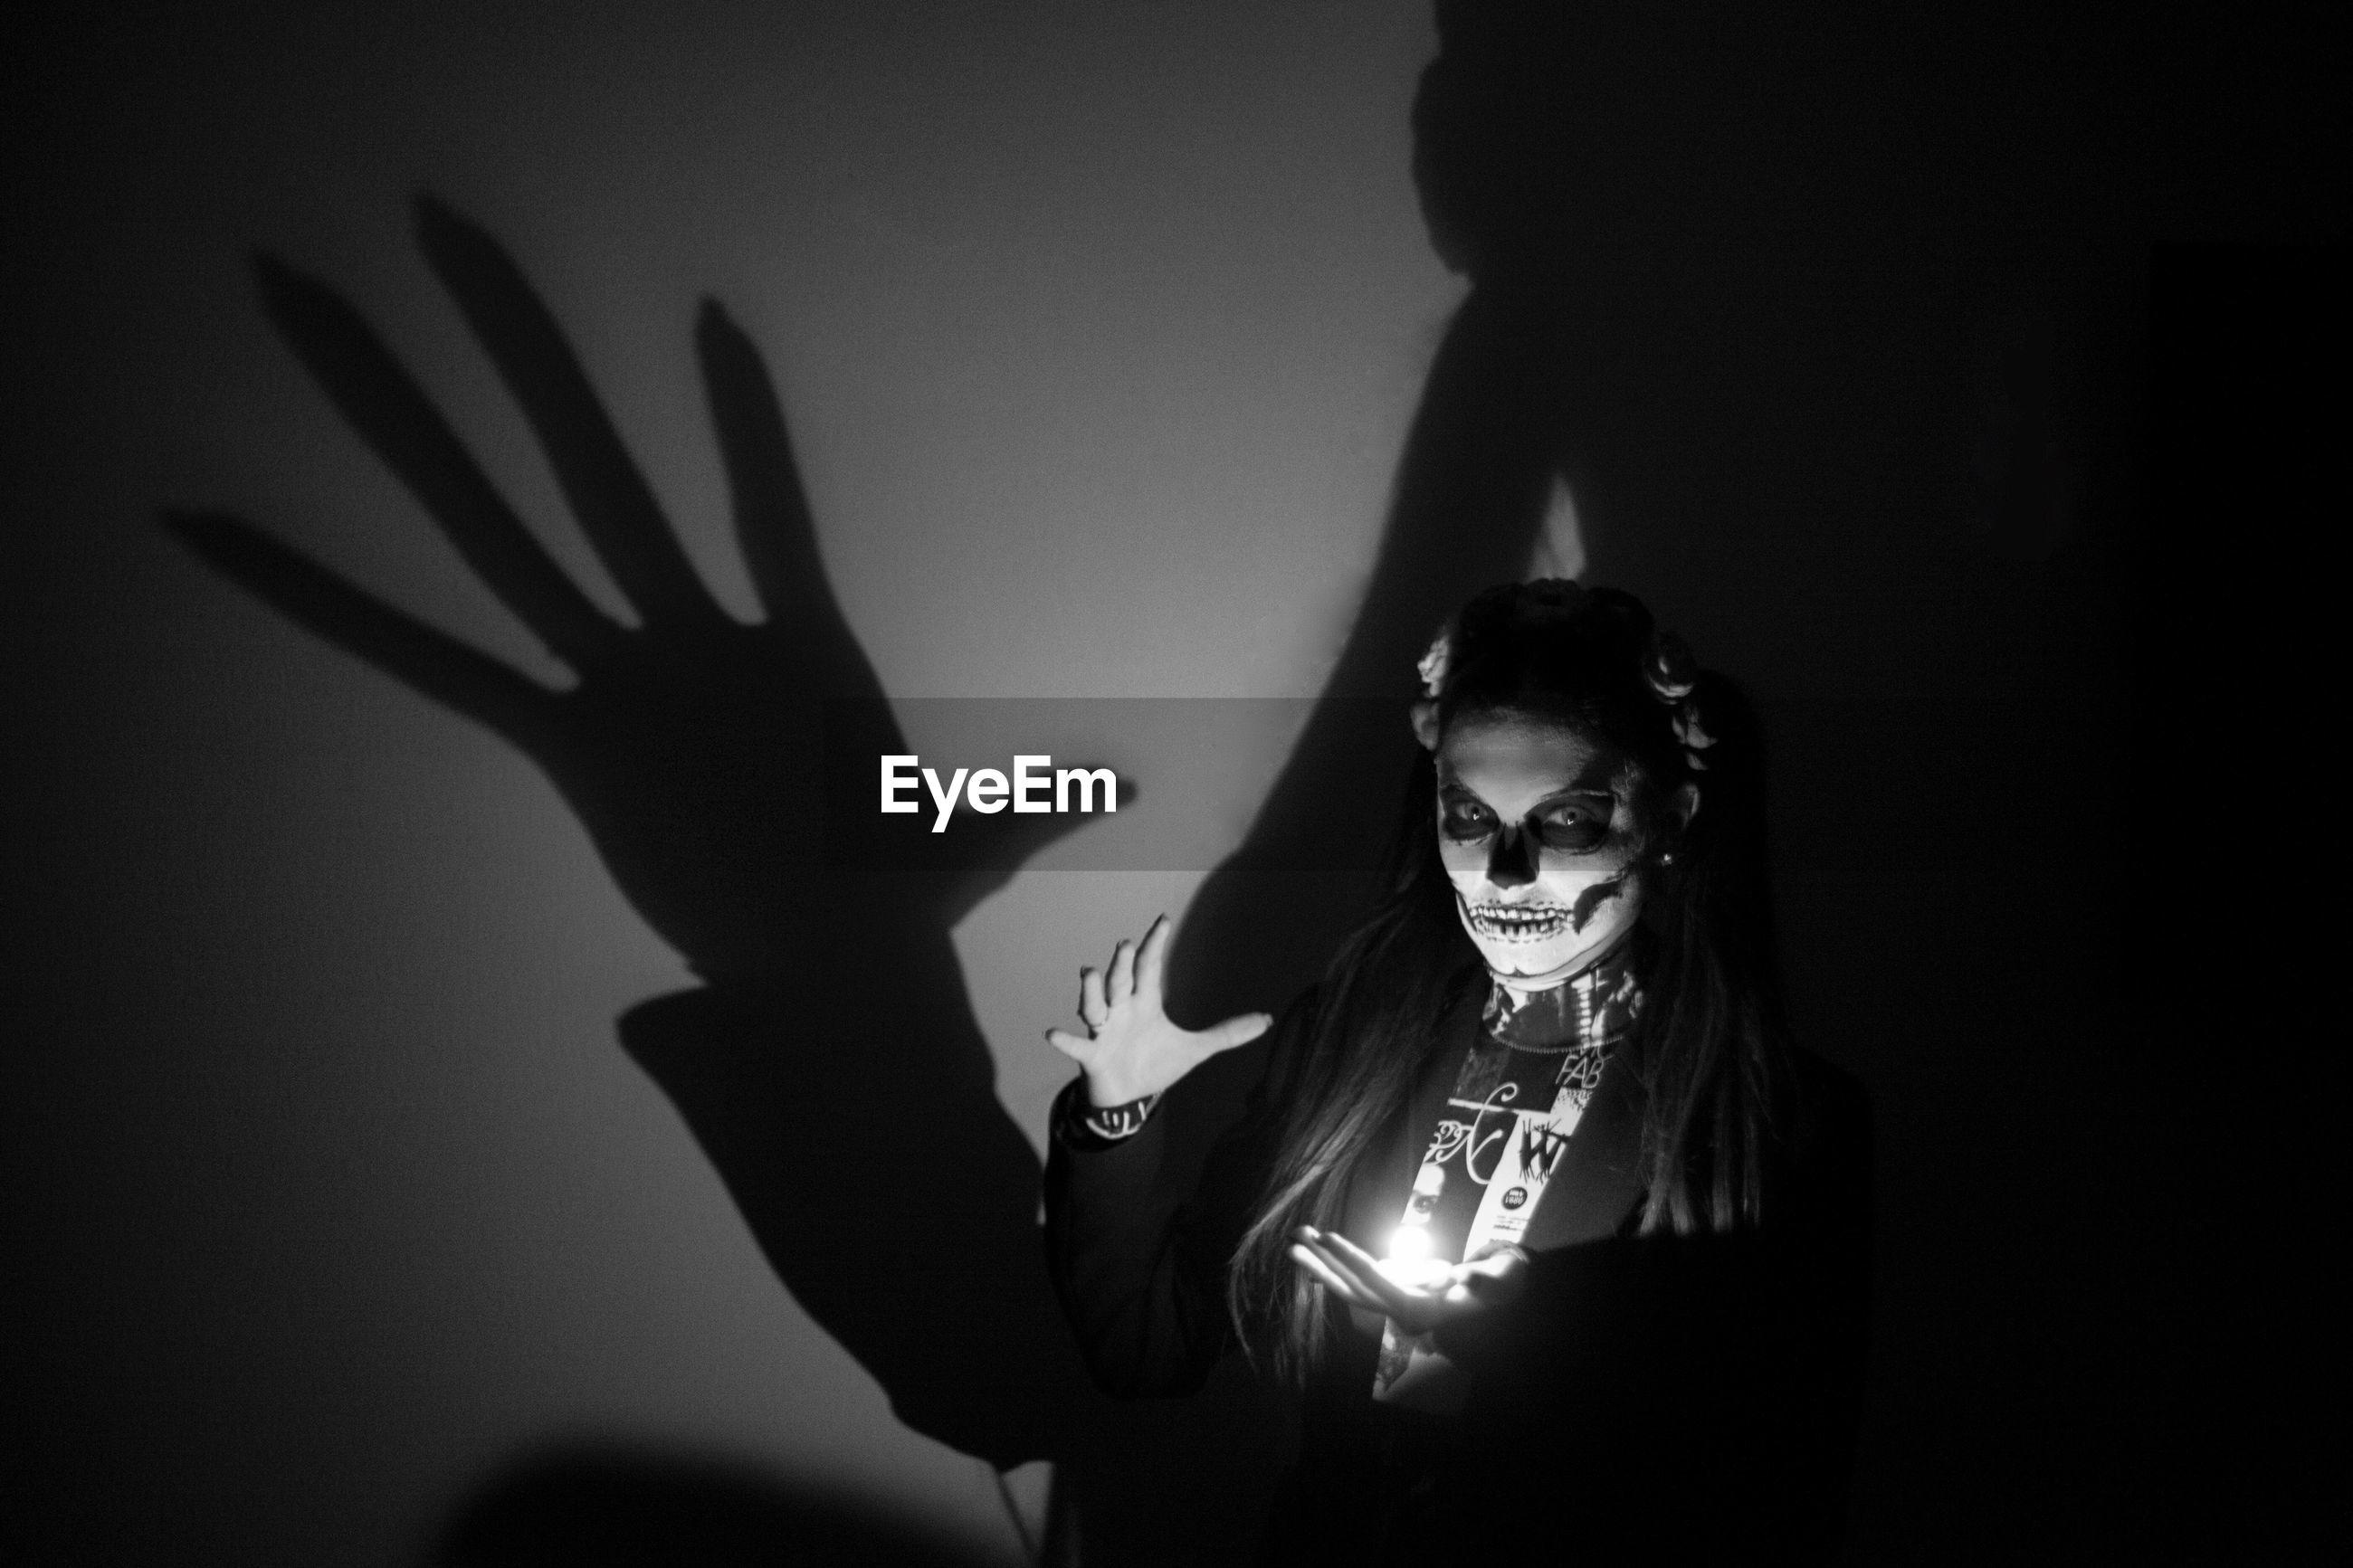 Portrait of spooky woman standing with illuminated lighting equipment in darkroom